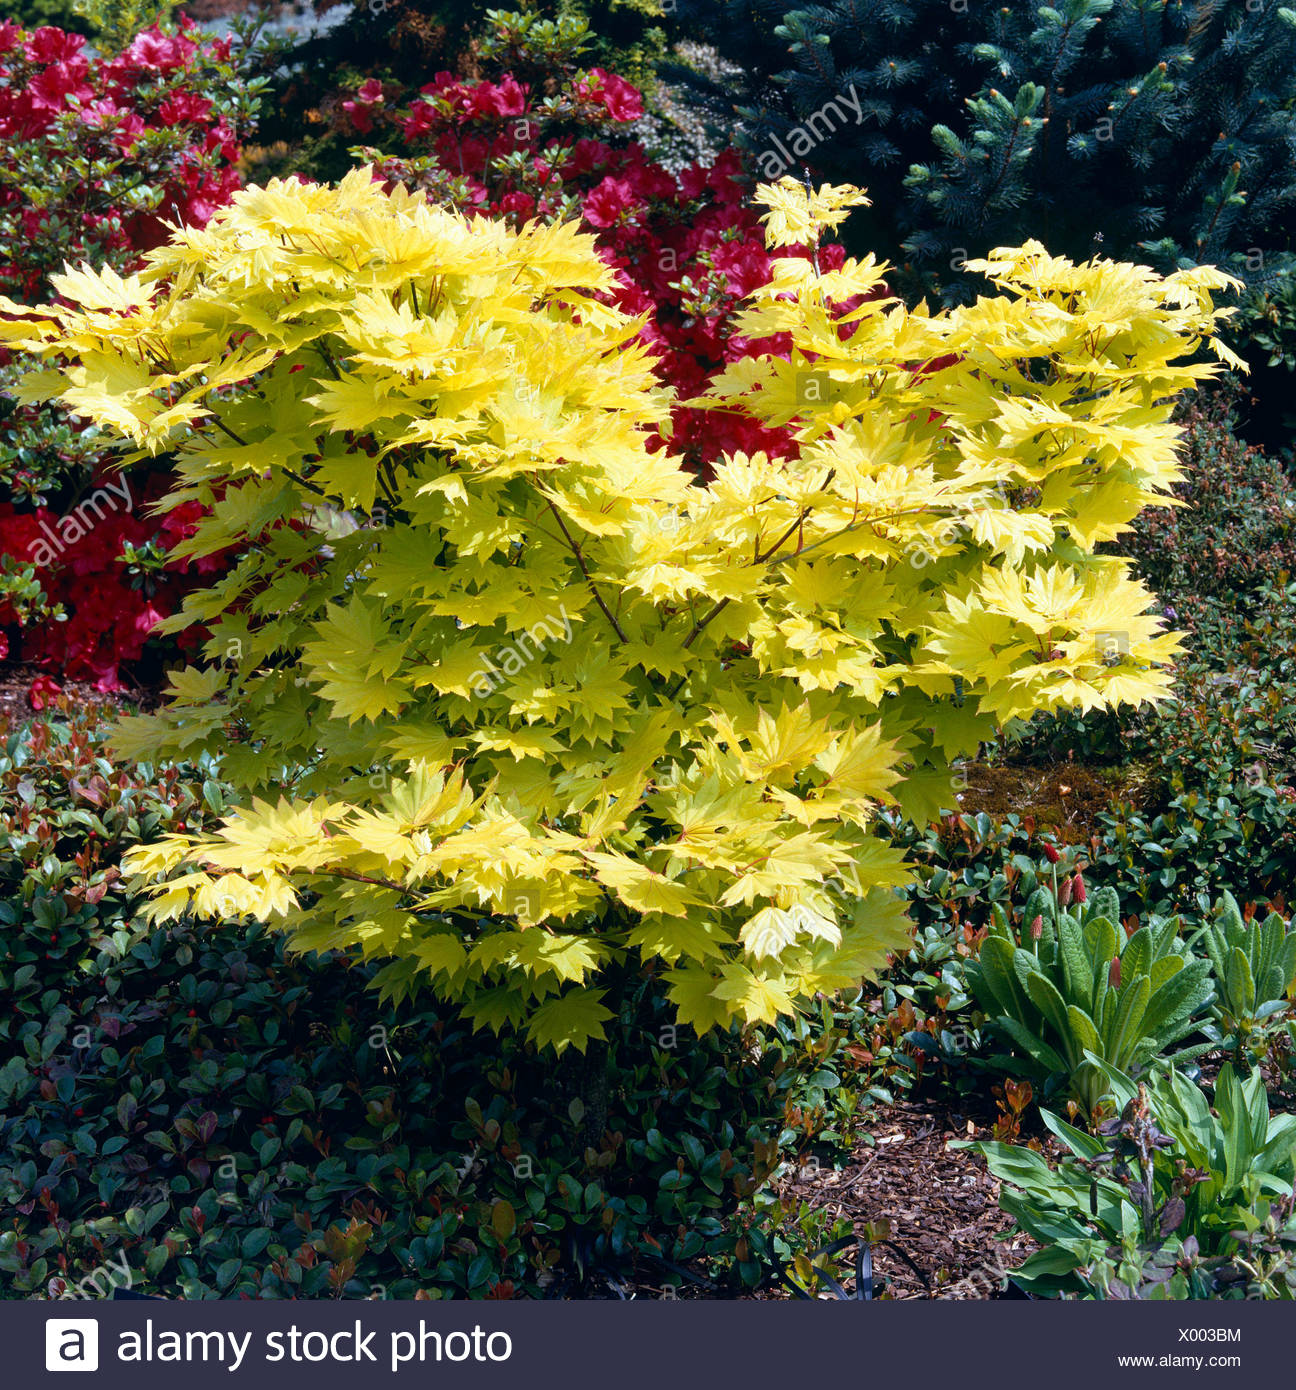 Acer Shirasawanum Aureum Agm Syn A Japonicum Aureum